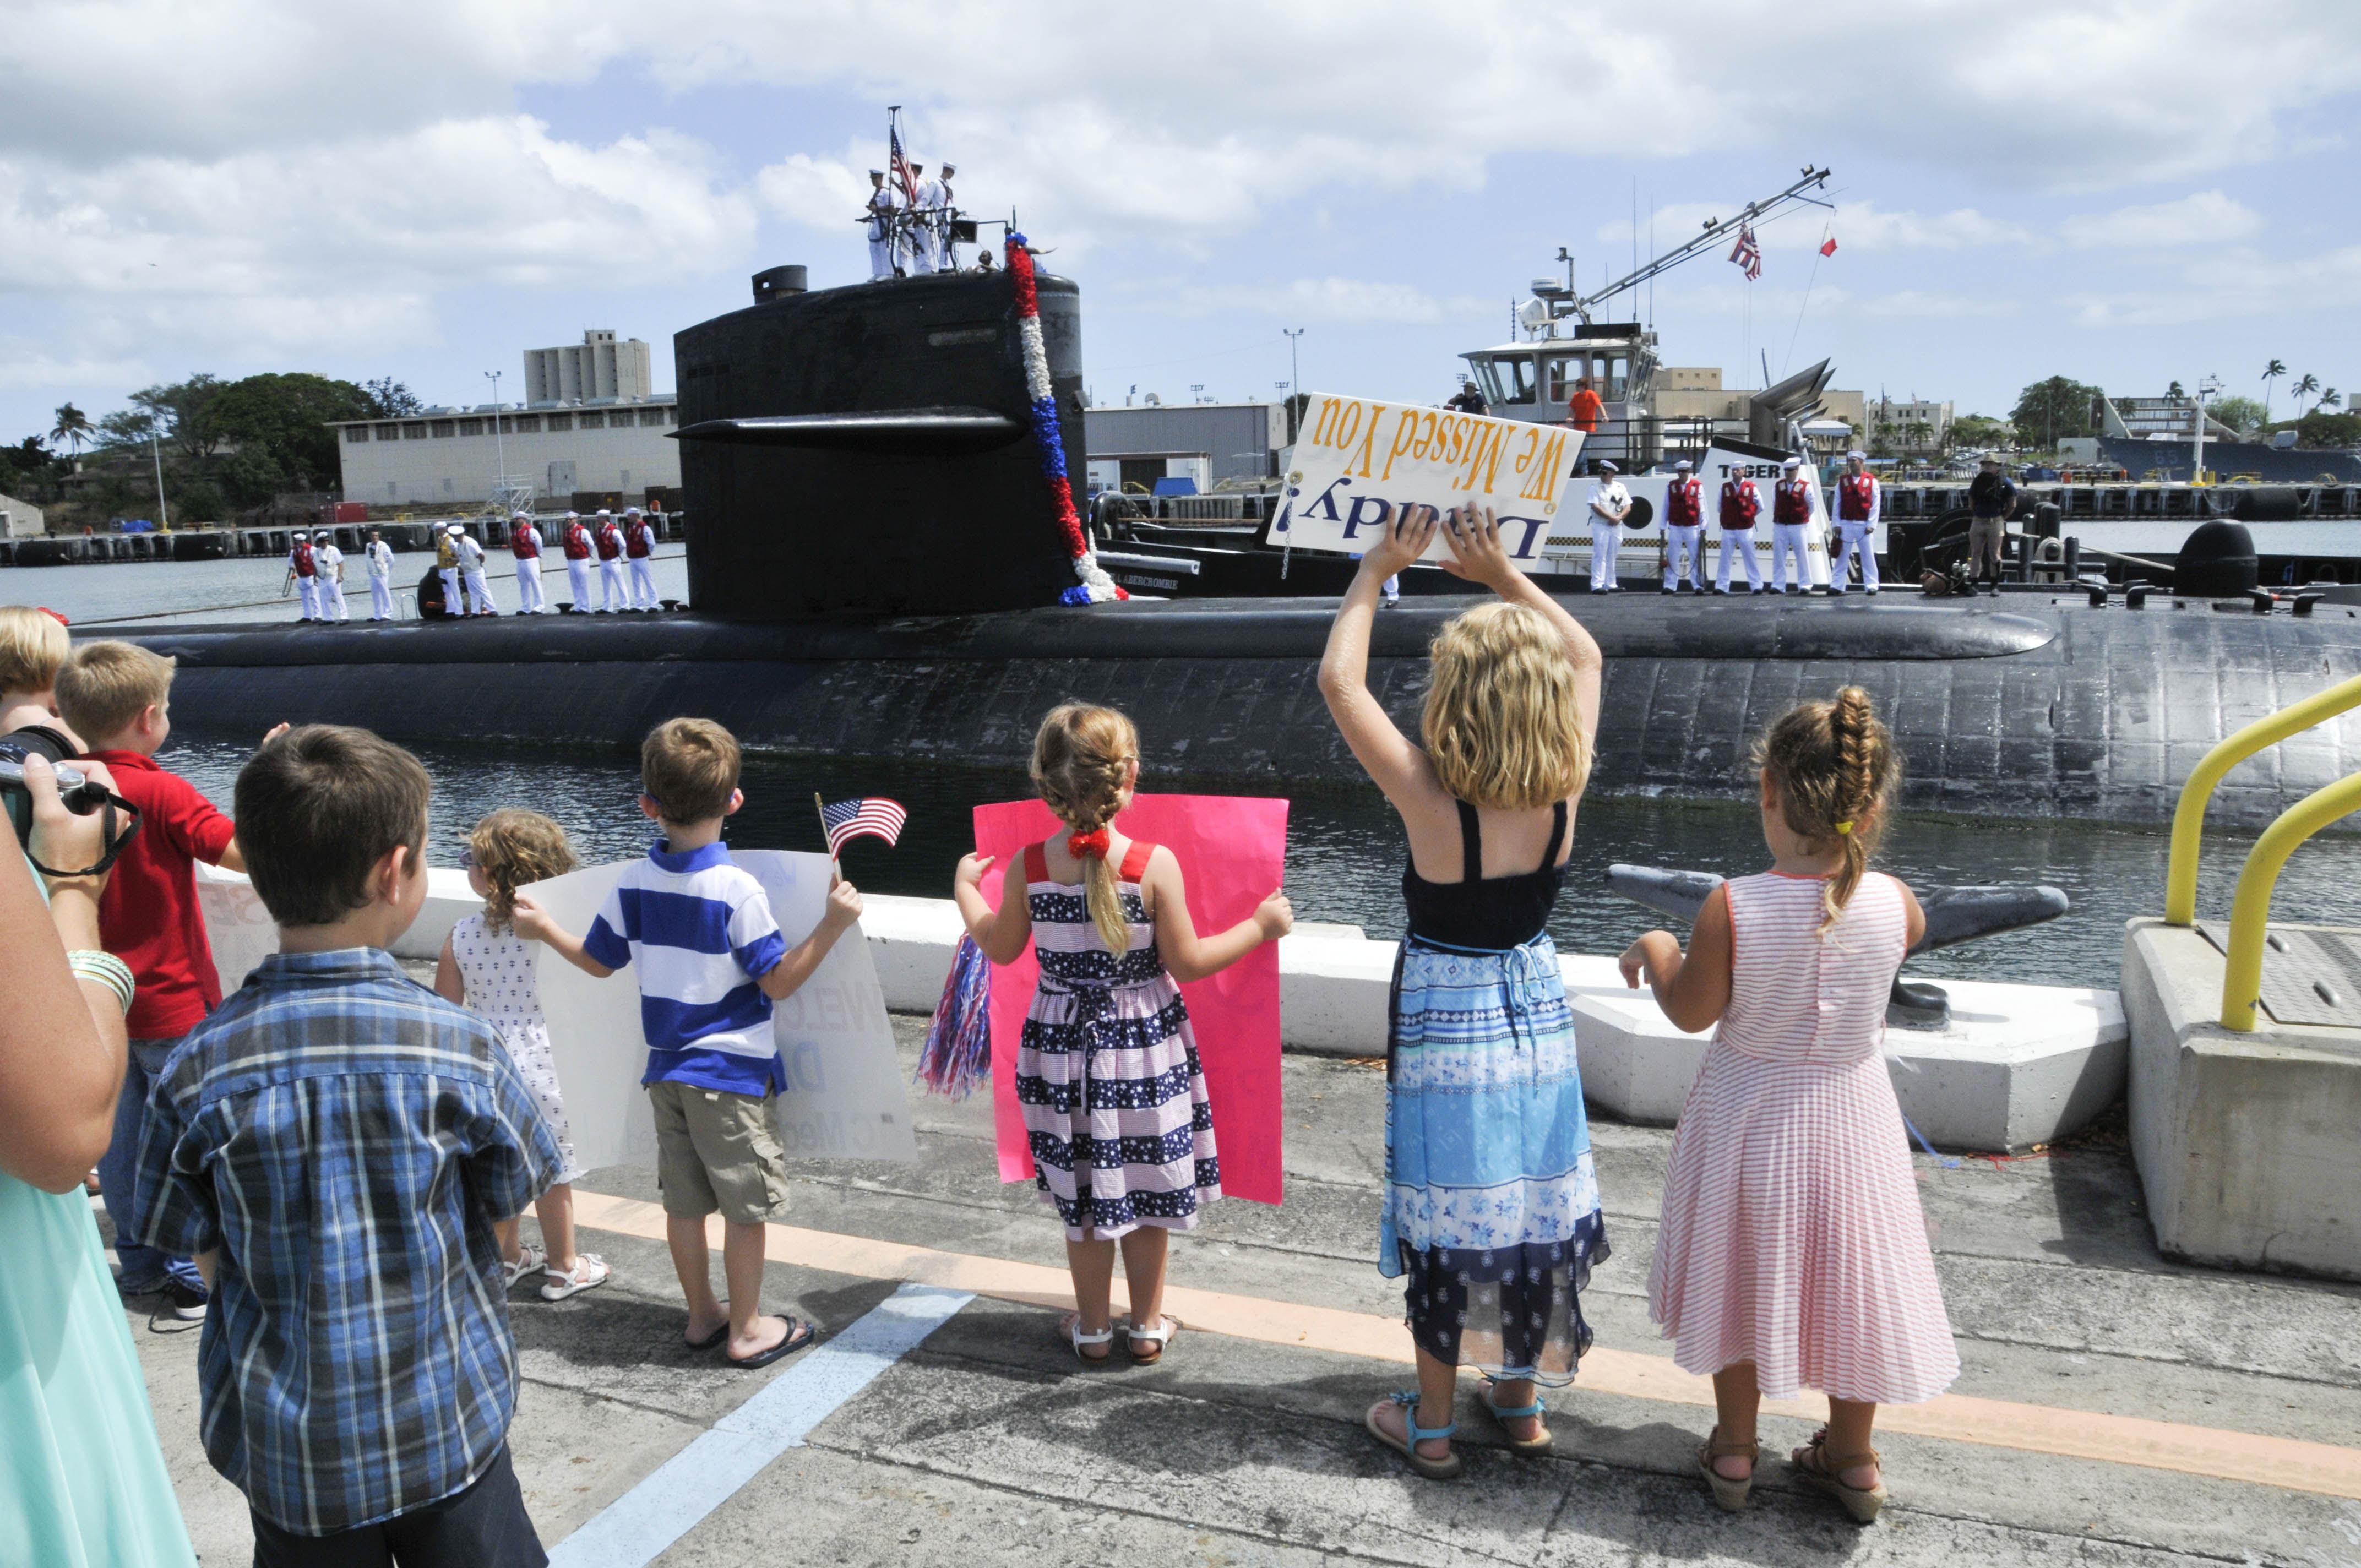 USS CITY OF CORPUS CHRISTI SSN-705 Einlaufen Pearl Harbor am 06.05.2014 Bild: U.S. Navy